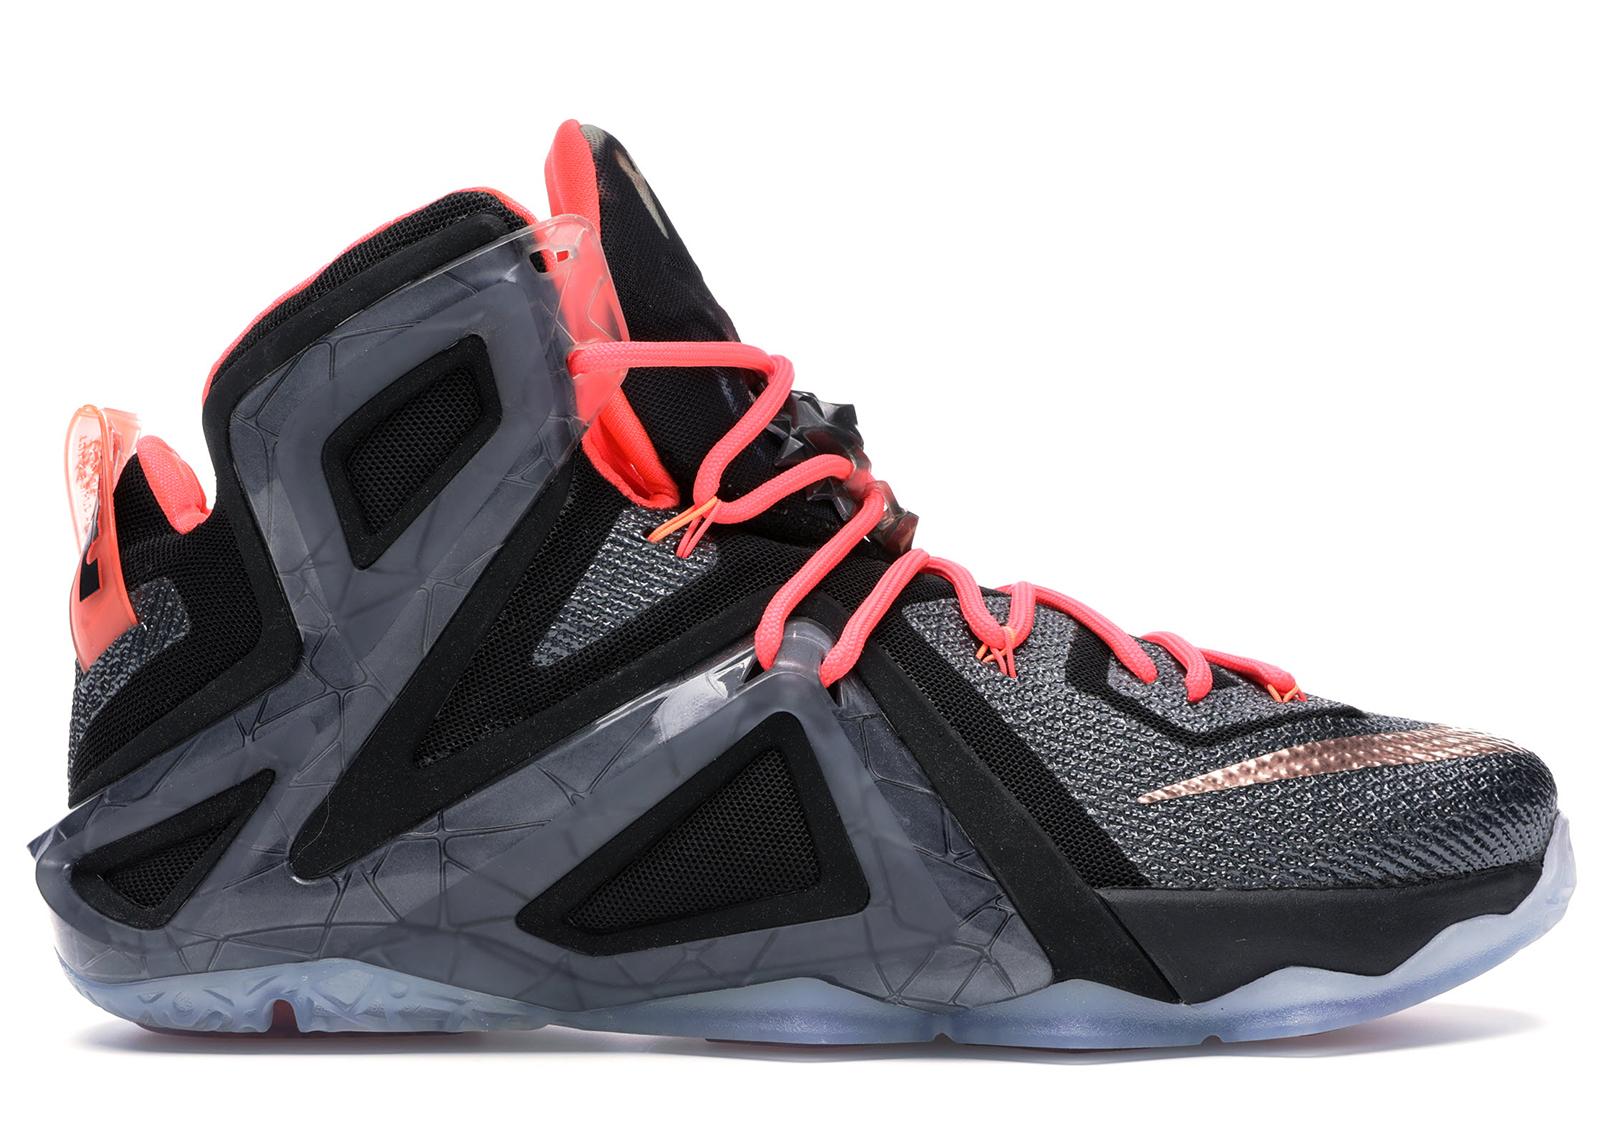 Buy Nike LeBron 12 Shoes \u0026 Deadstock